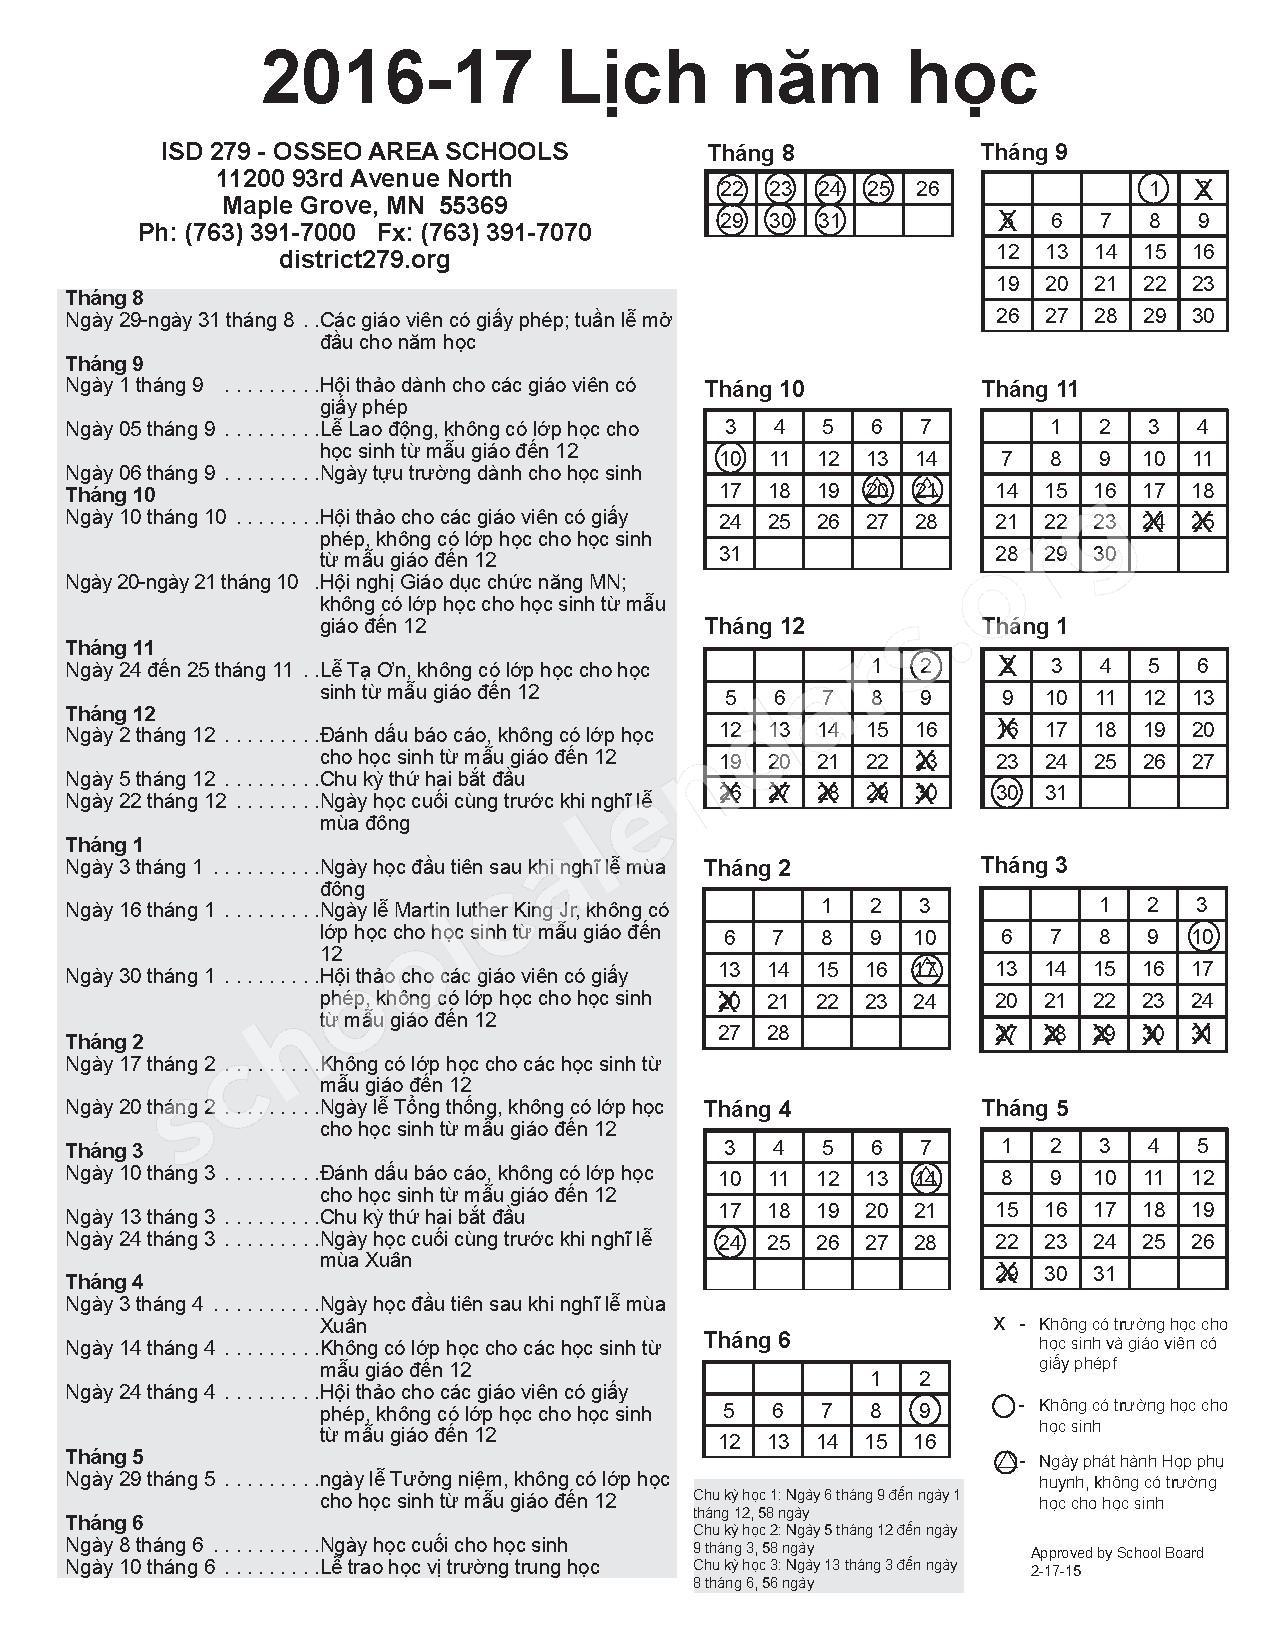 2016 - 2017 Vietnamese Calendar – Edinbrook Elementary School – page 1